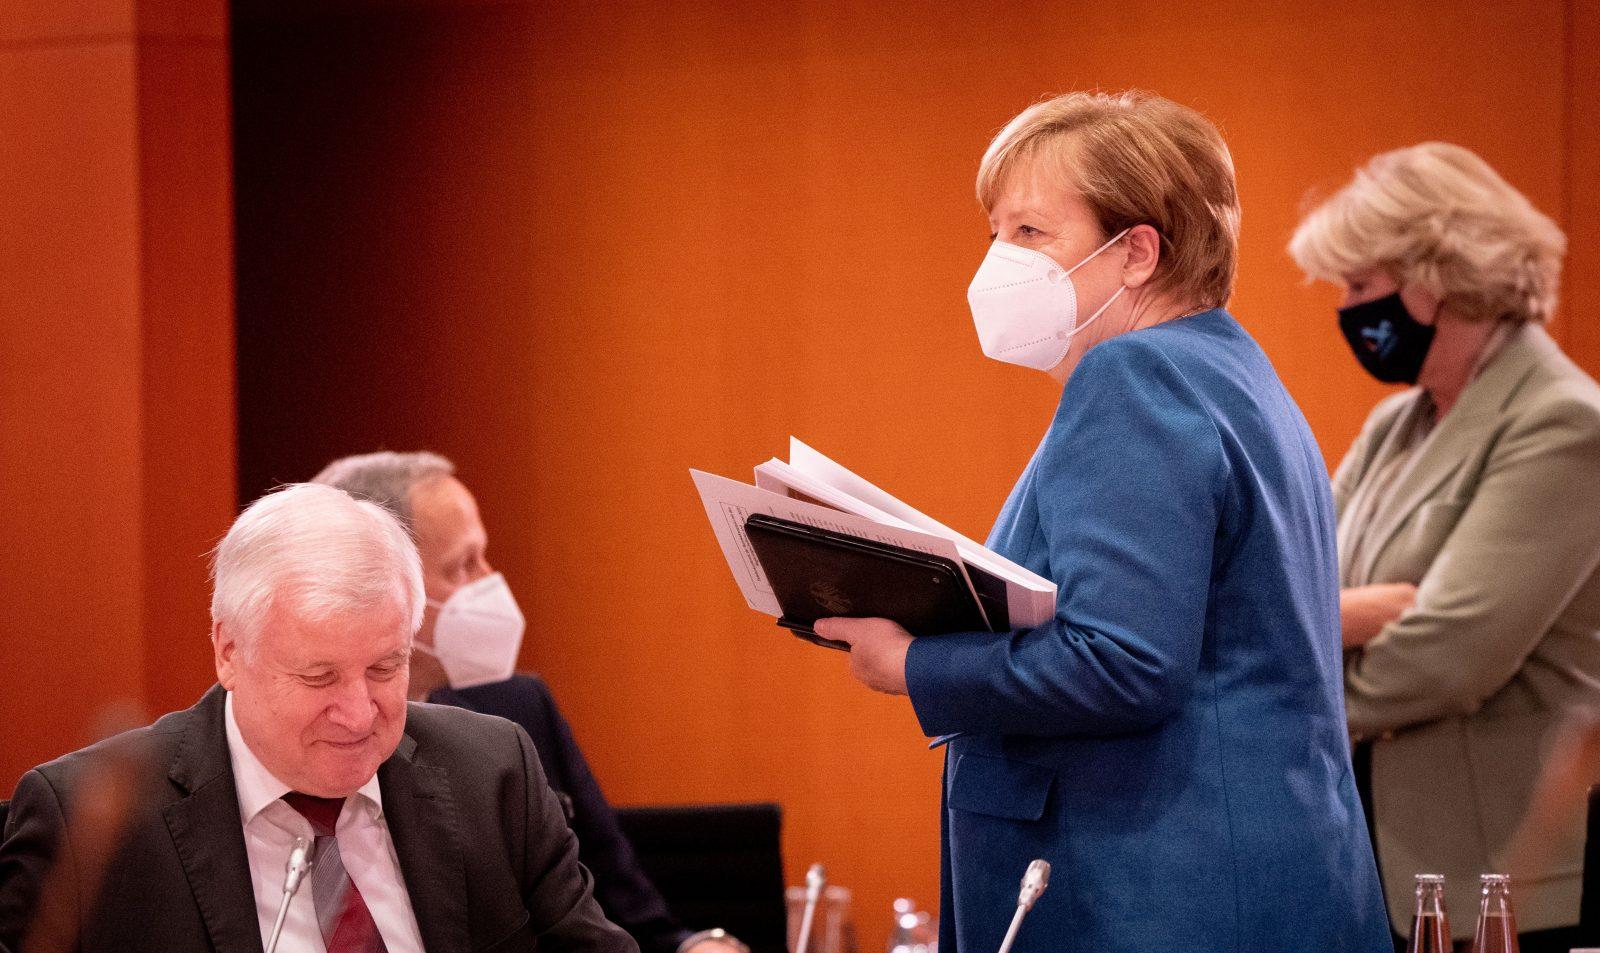 Bundeskanzlerin Angela Merkel (CDU) und Bundesinnenminister Horst Seehofer (CSU) verschärfen die Corona-Regeln Foto: picture alliance/Kay Nietfeld/dpa-Pool/dpa